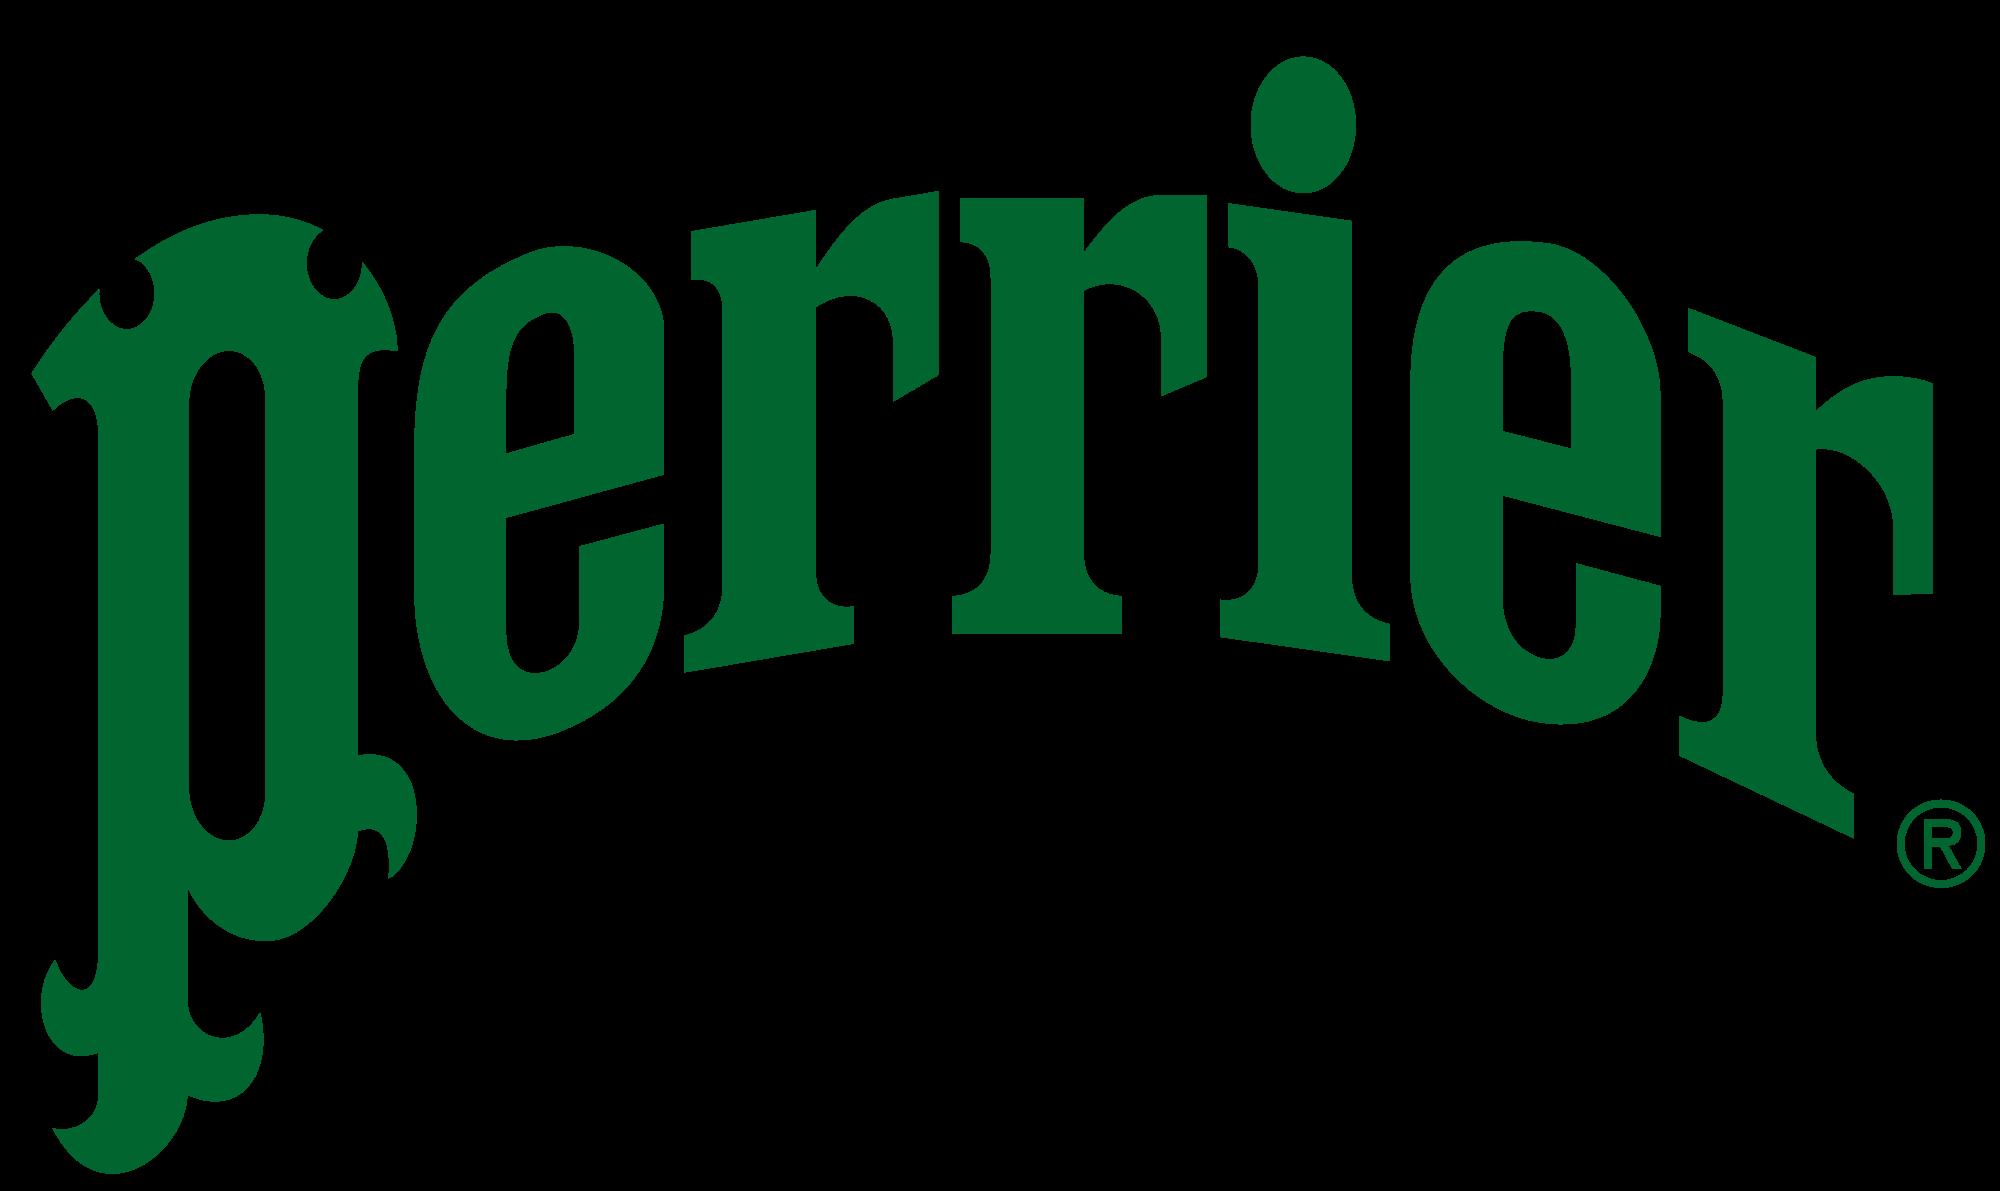 perrier-logo.png